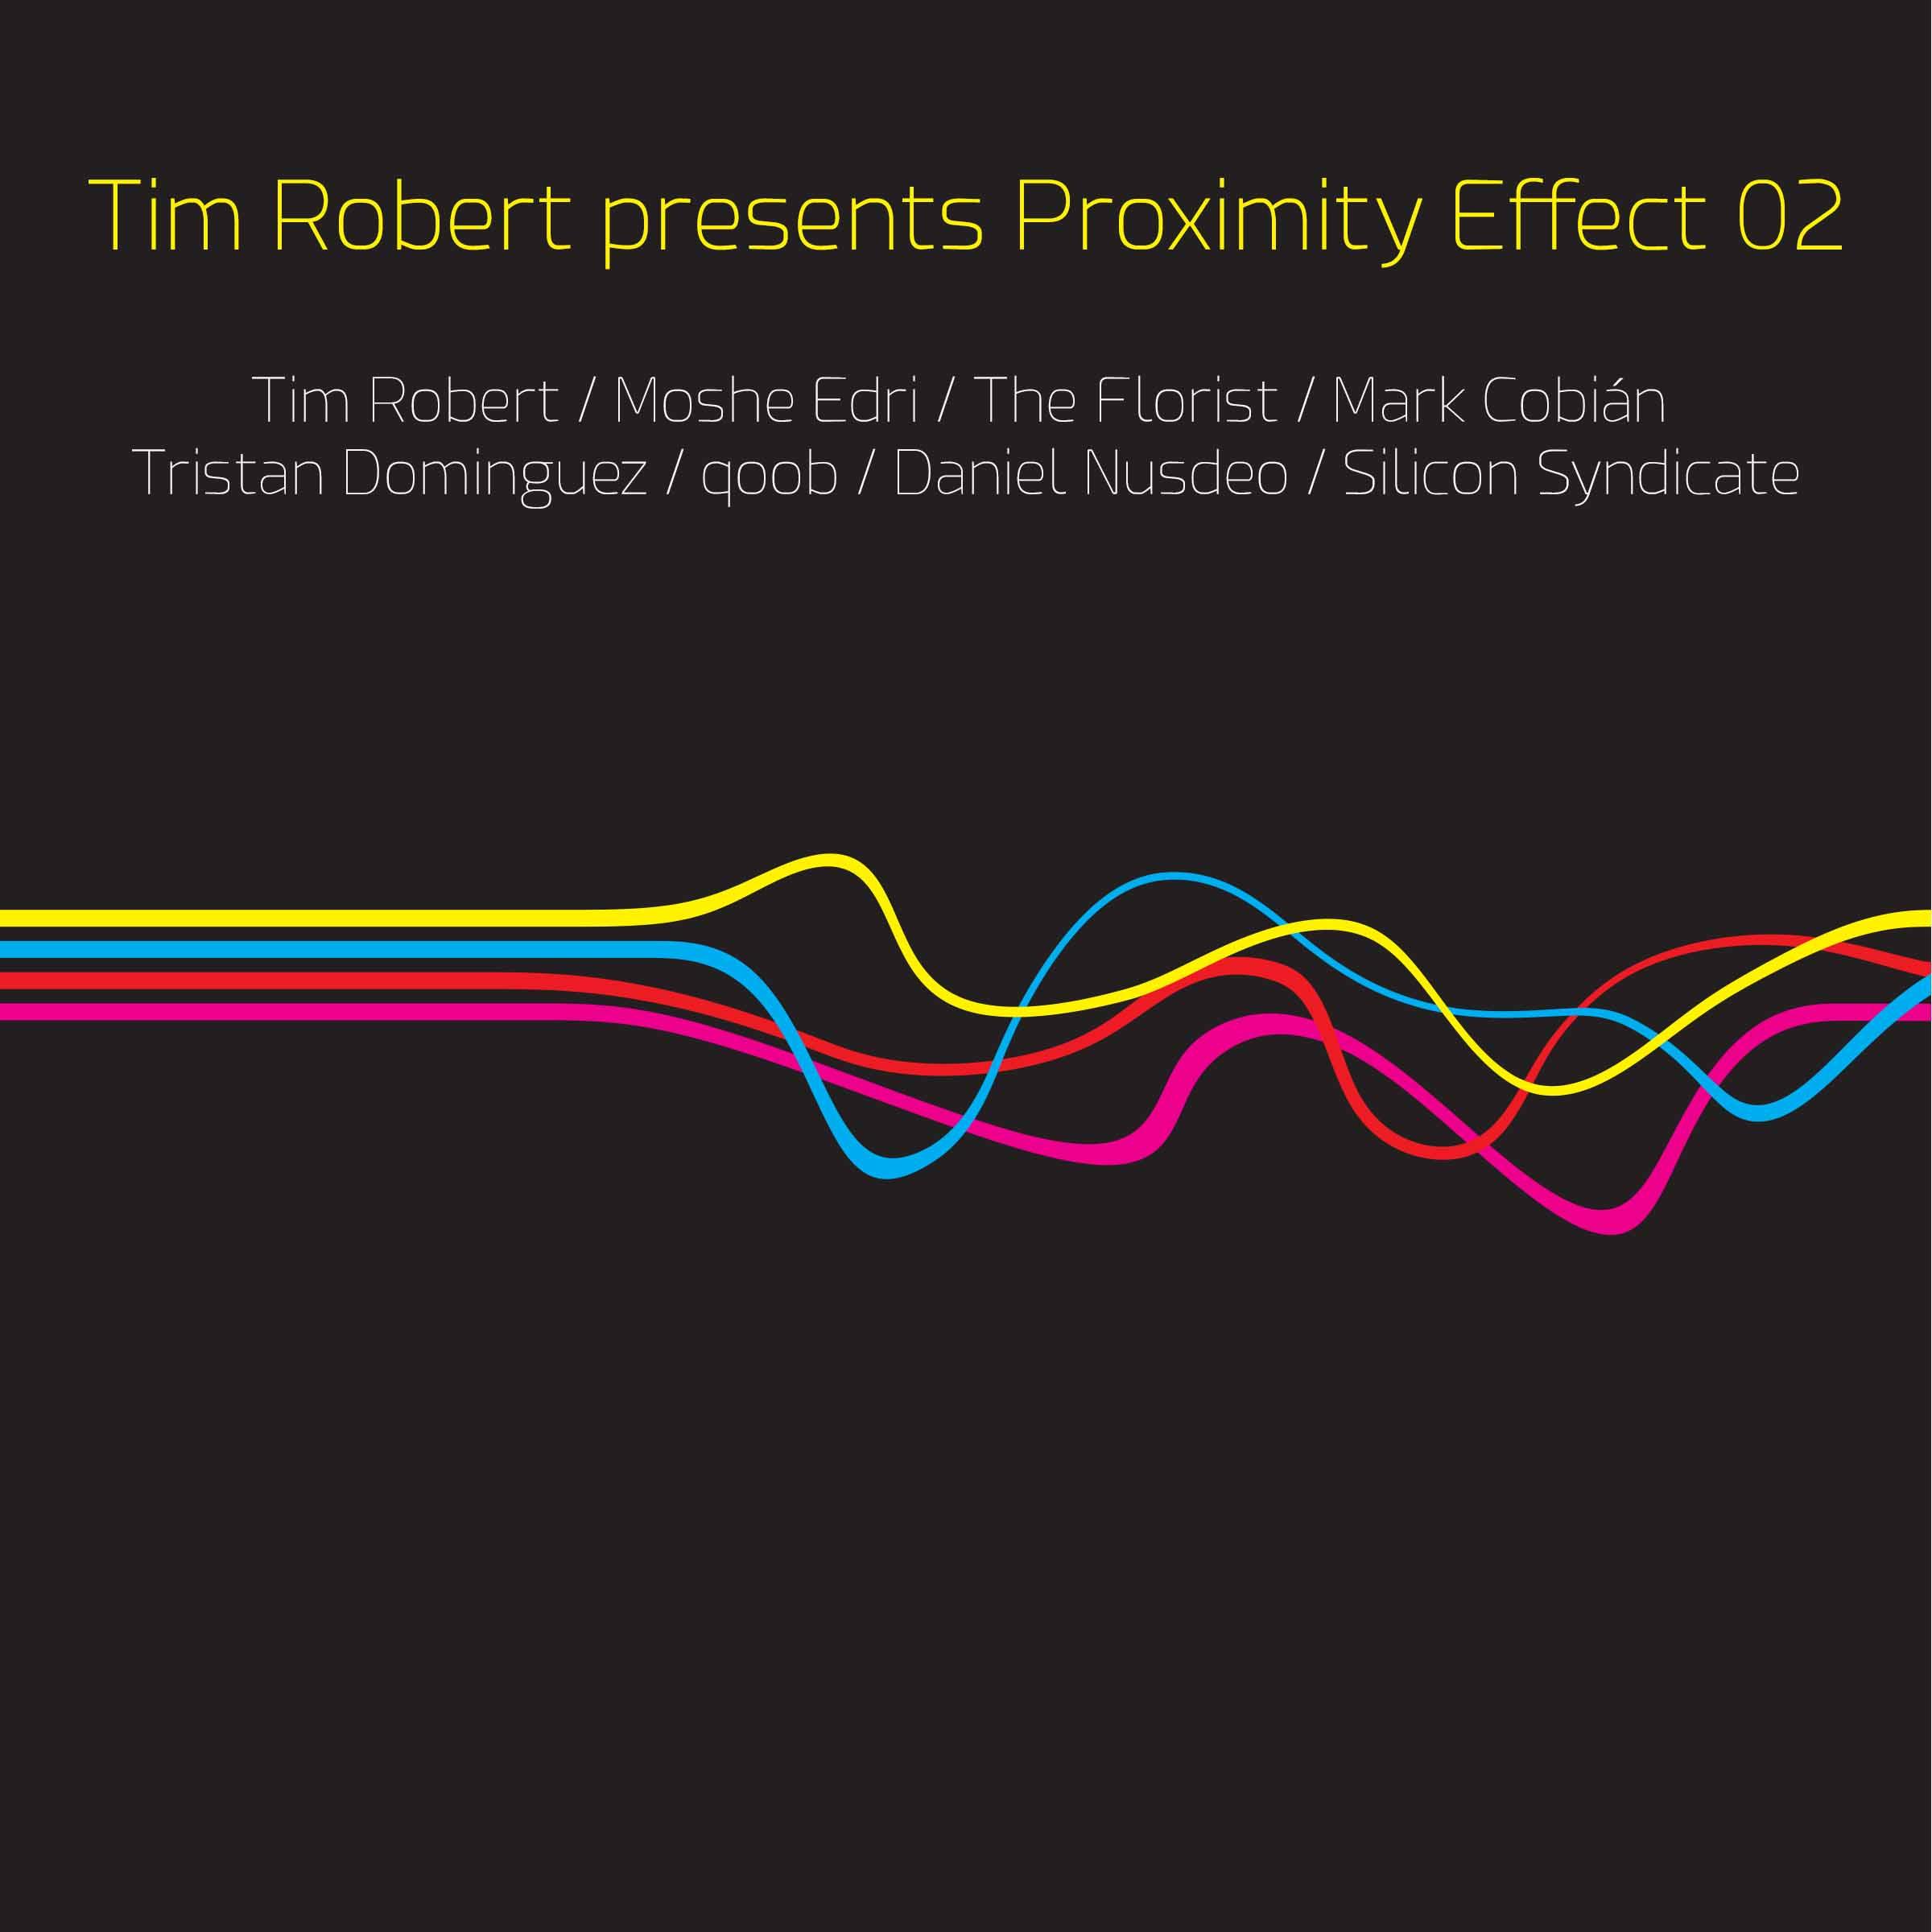 Tim Robert presents Proximity Effect